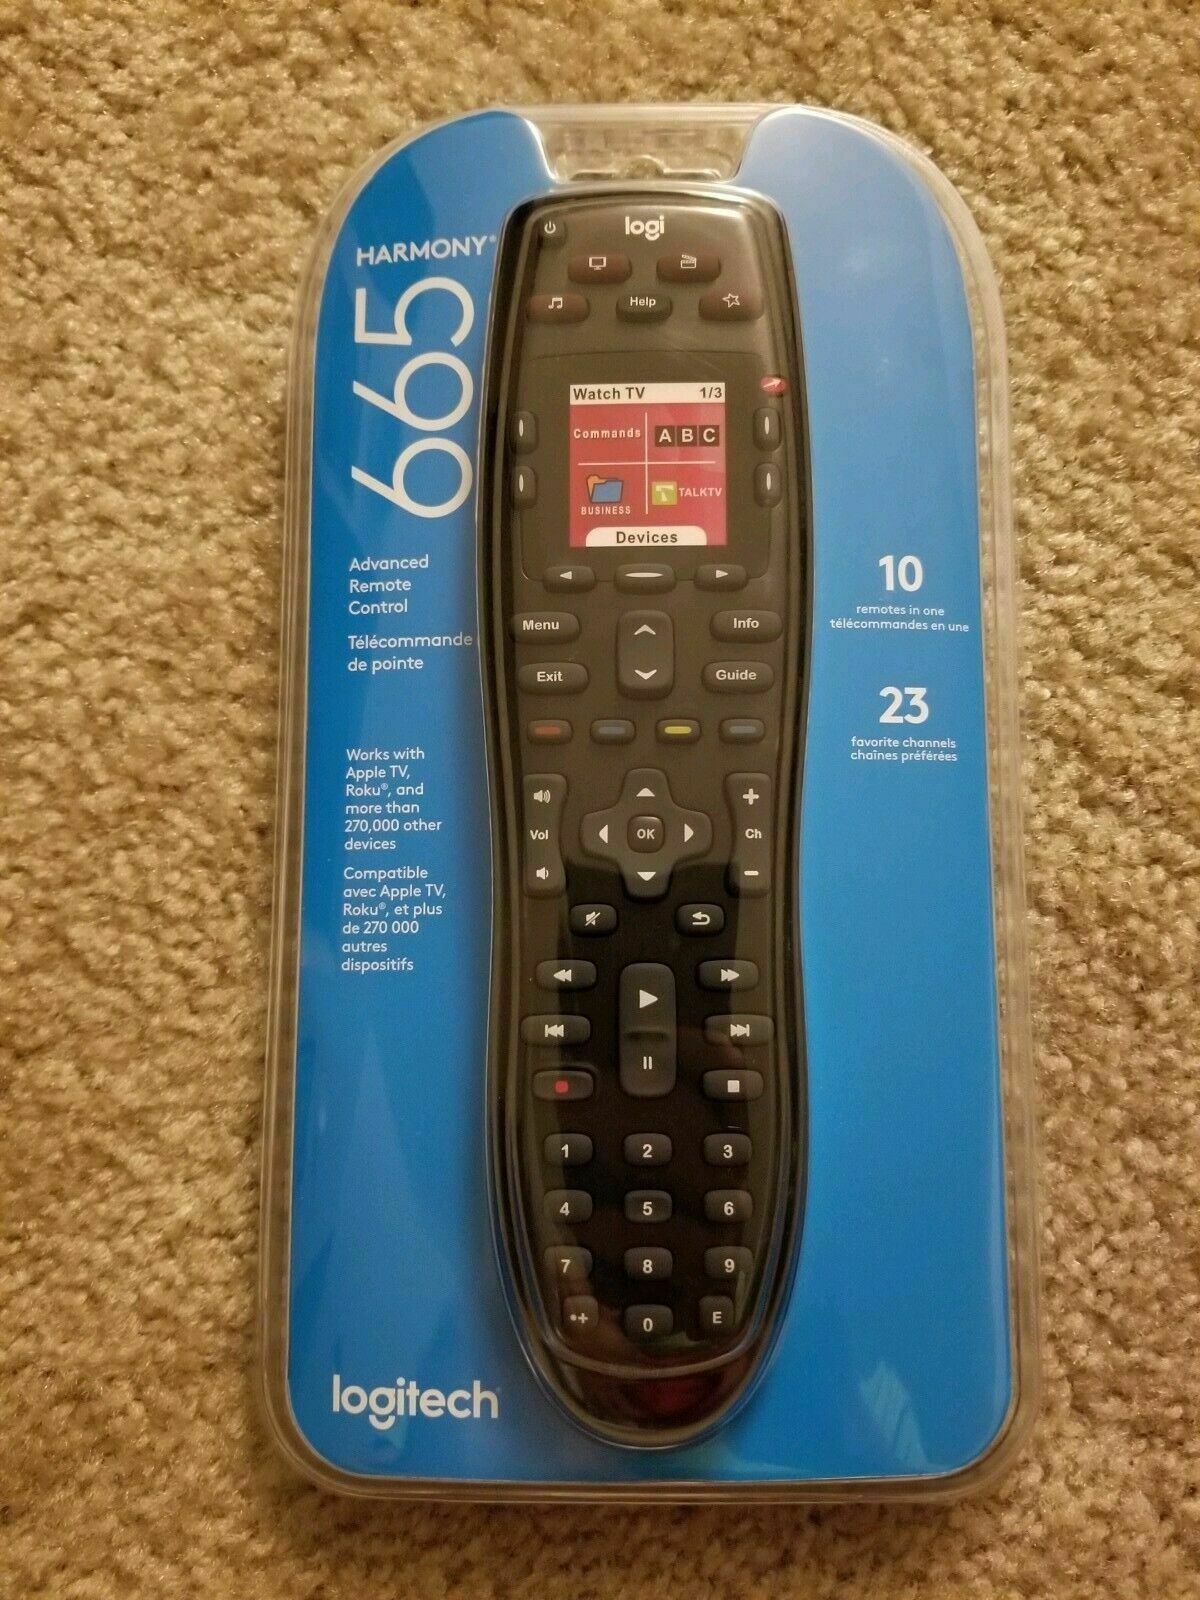 ADVANCED Logi tech Harmony 665 remote control w/USB cord universal screen light